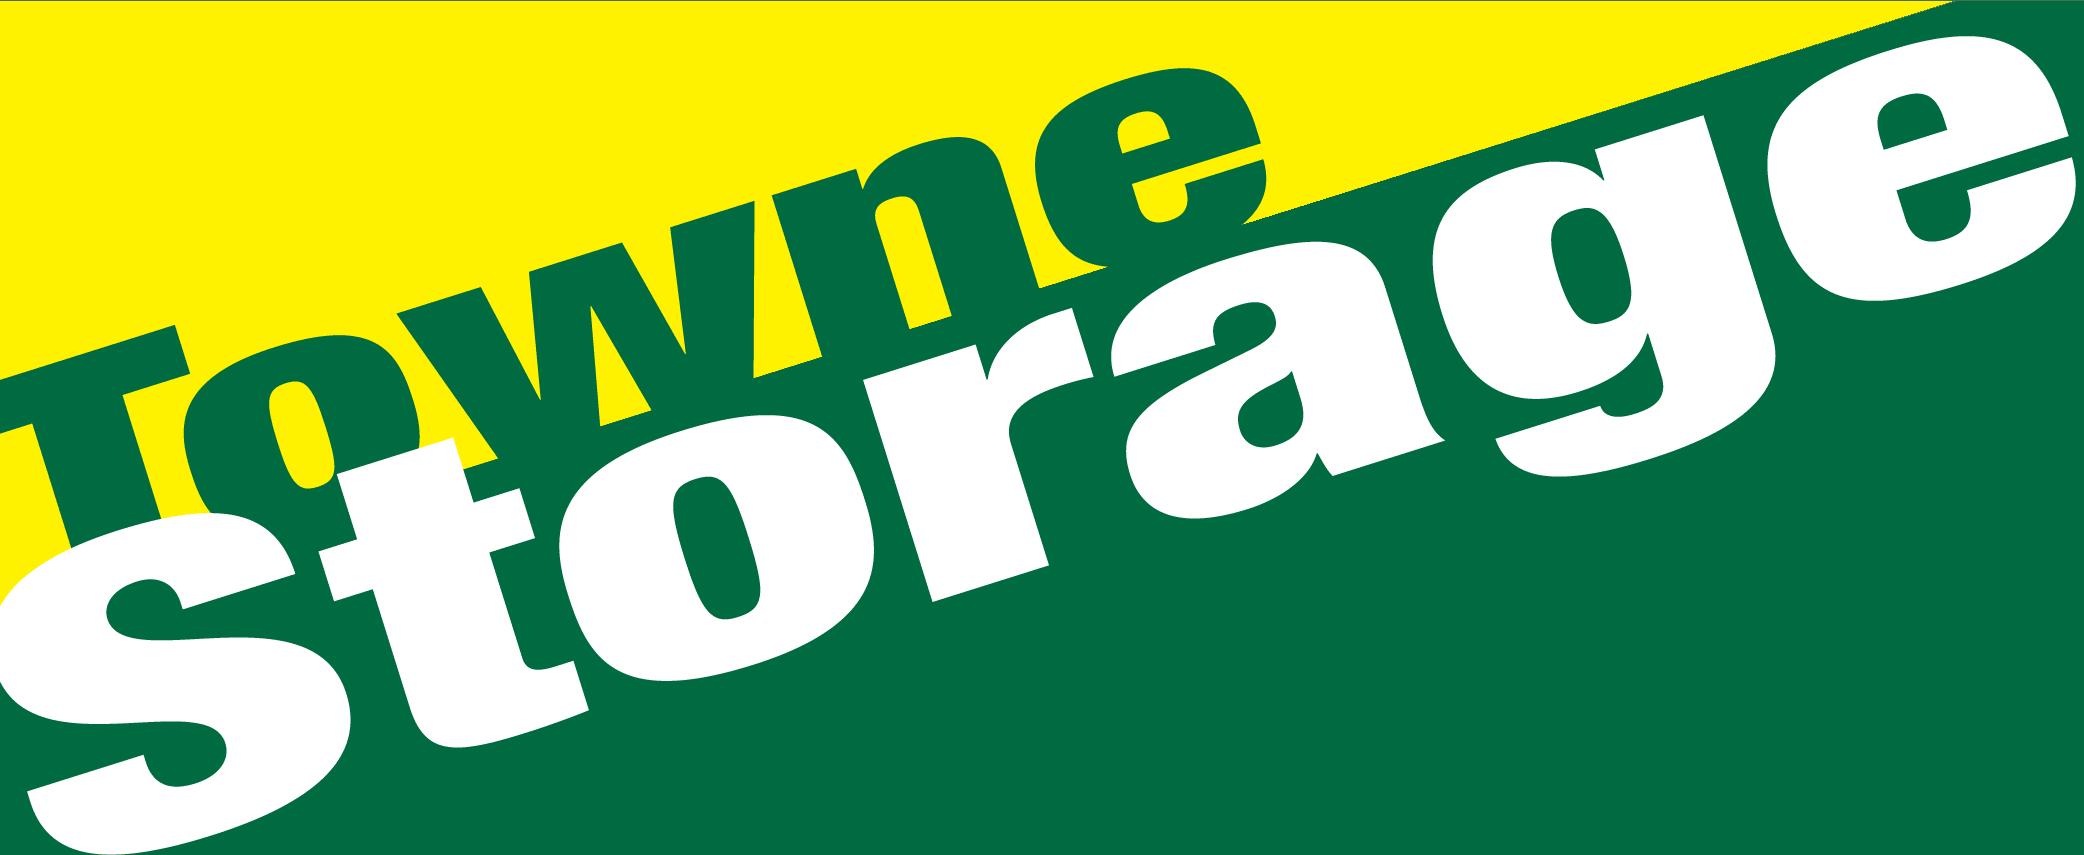 Towne Storage - Charleston logo